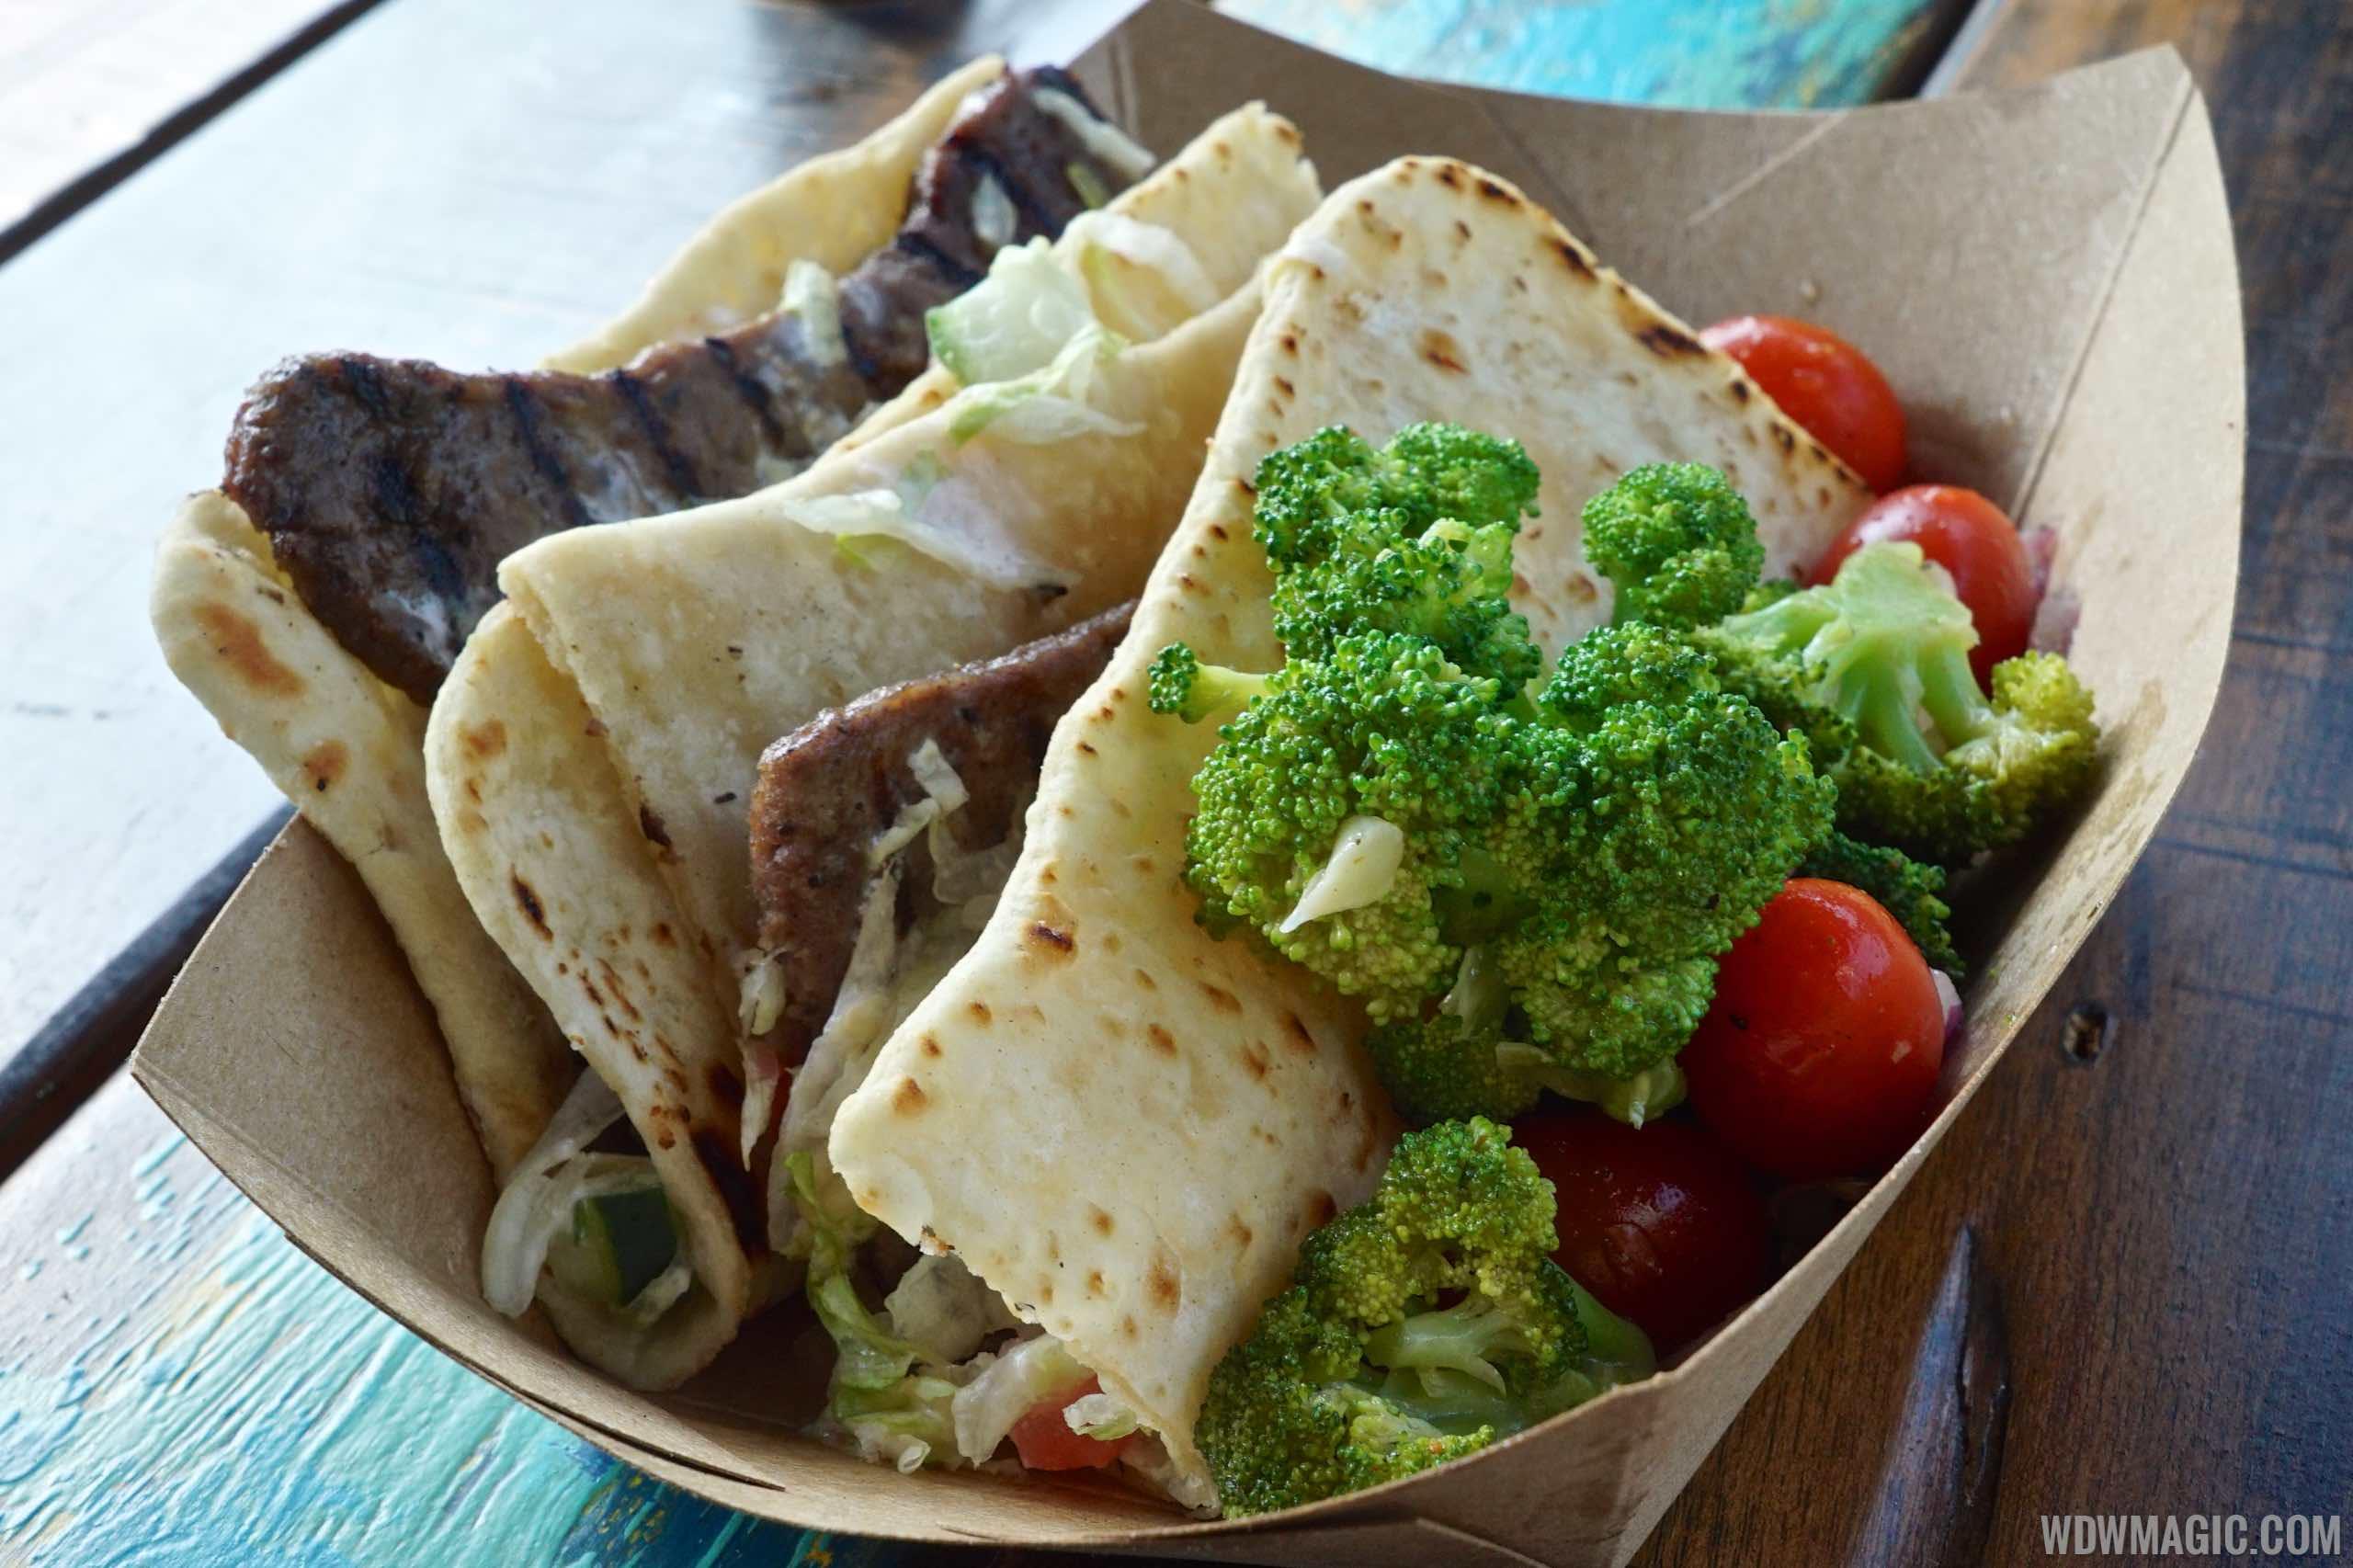 Harambe Market Food - Ground Beef Kabob Flatbread with broccoli and tomato salad $9.49